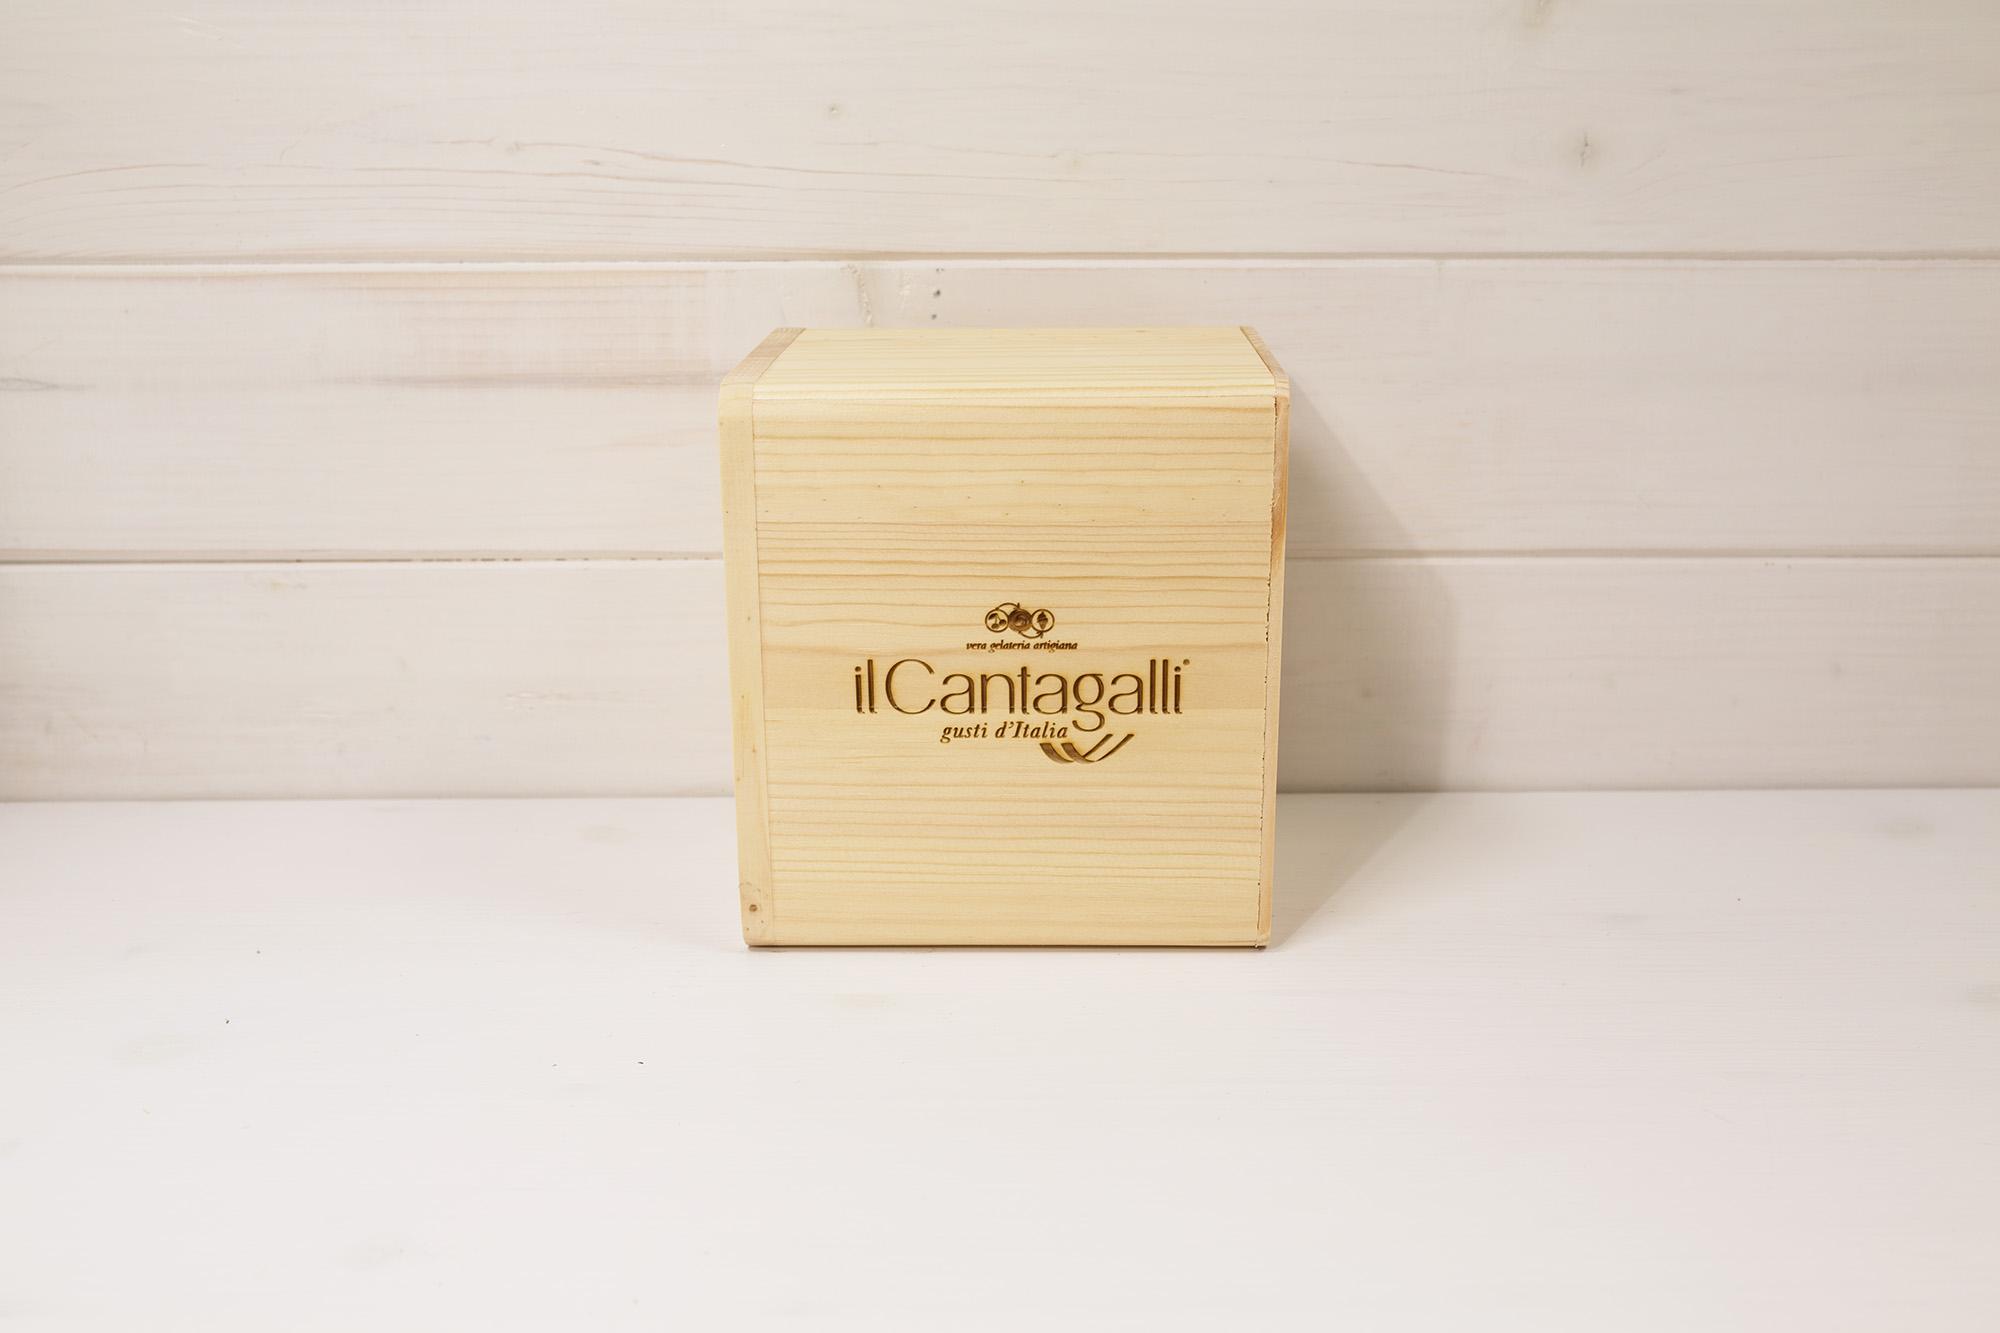 Virrina - Porta-tovaglioli Da Bar - Il Cantagalli